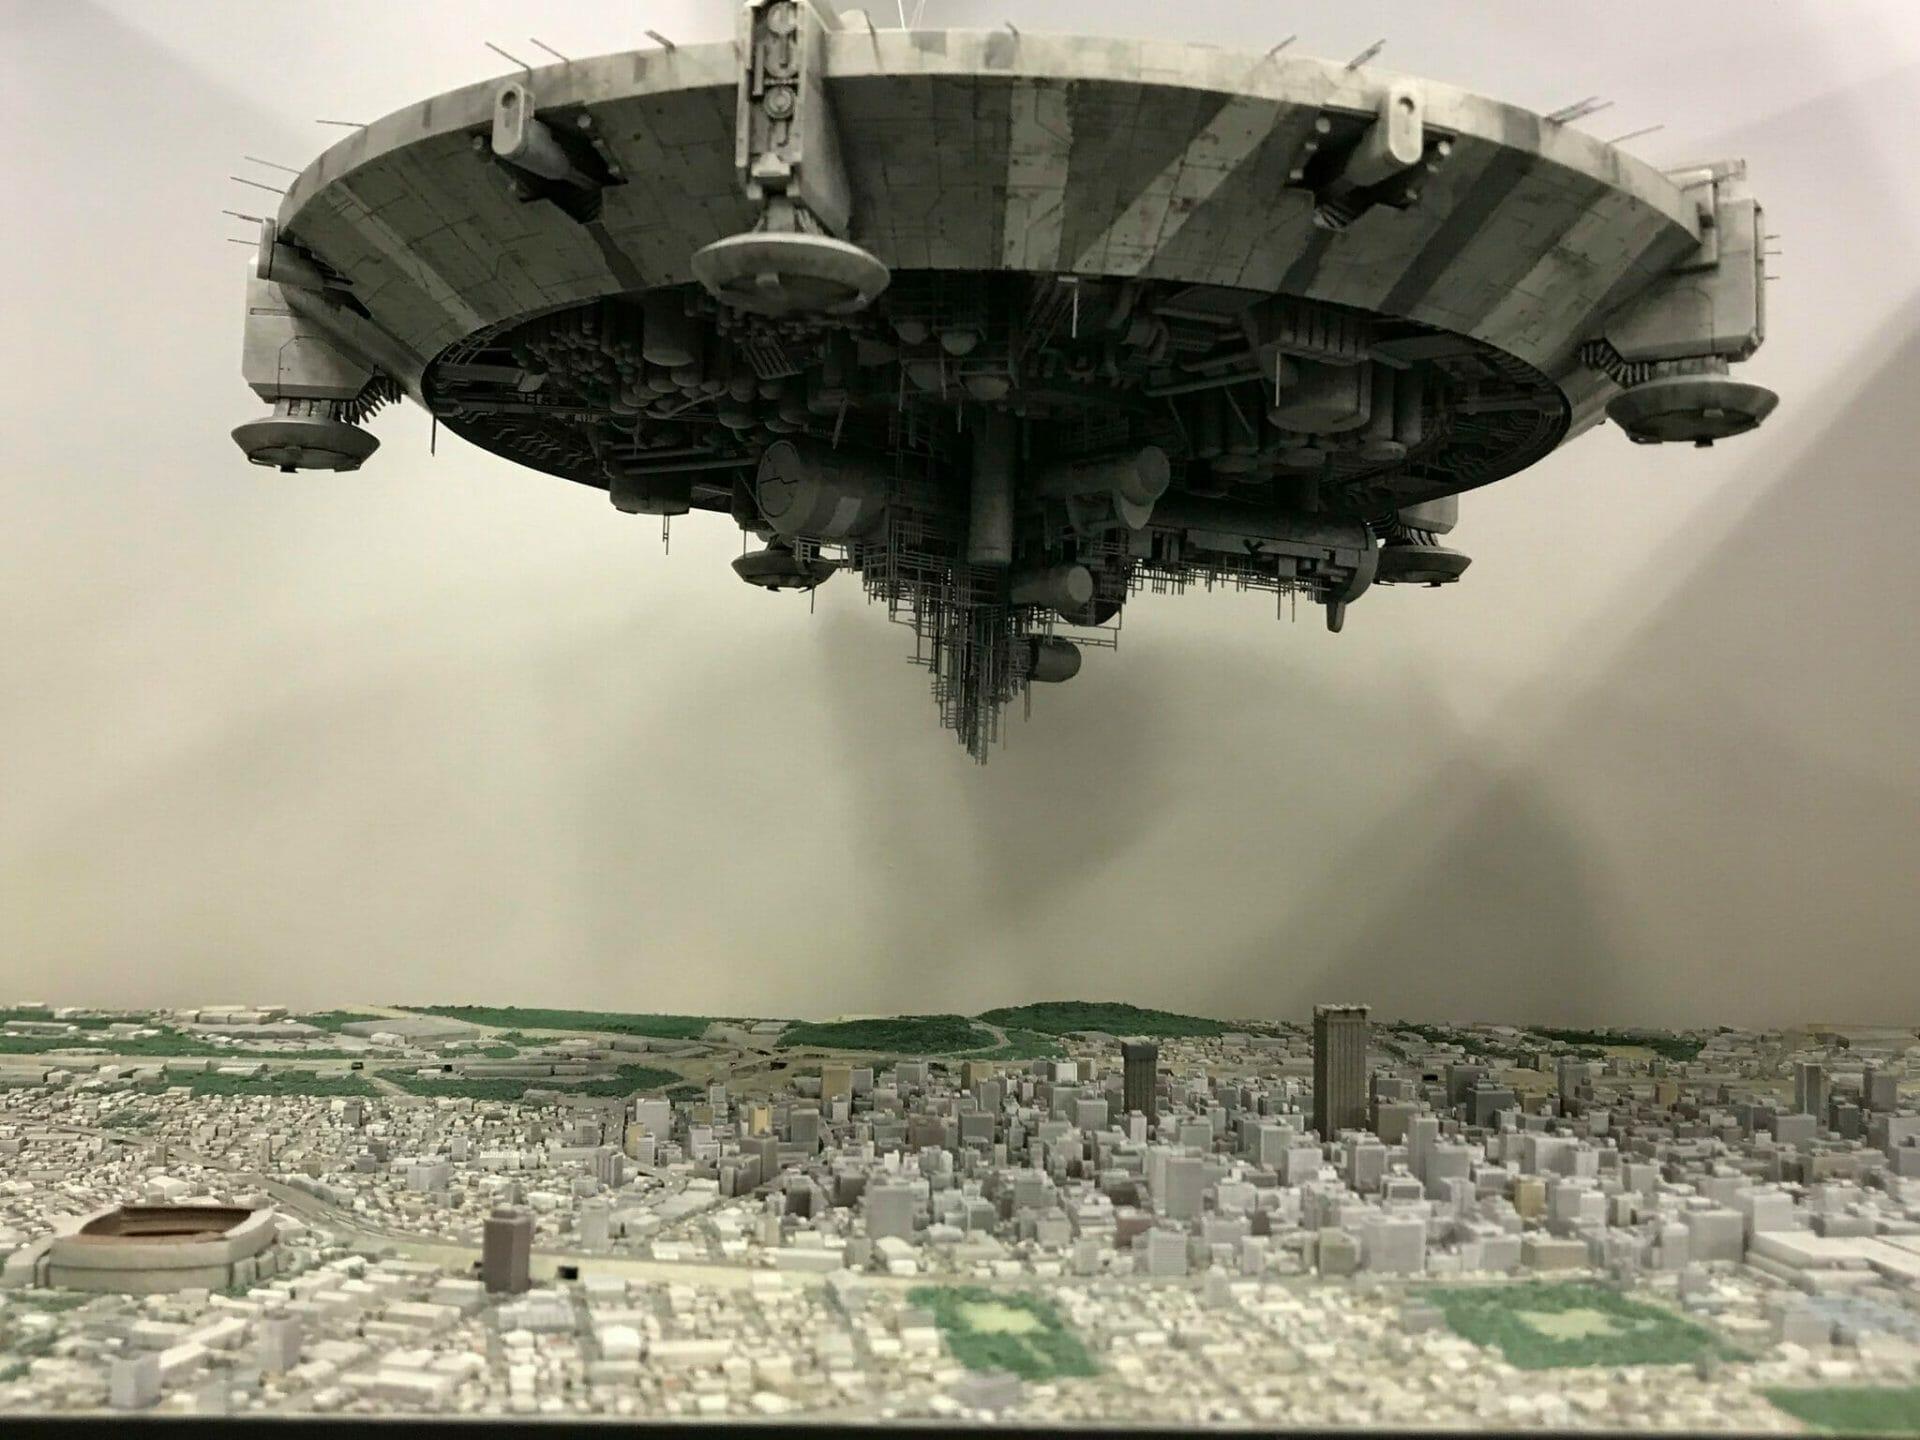 Stunning detail on this District 9 diorama